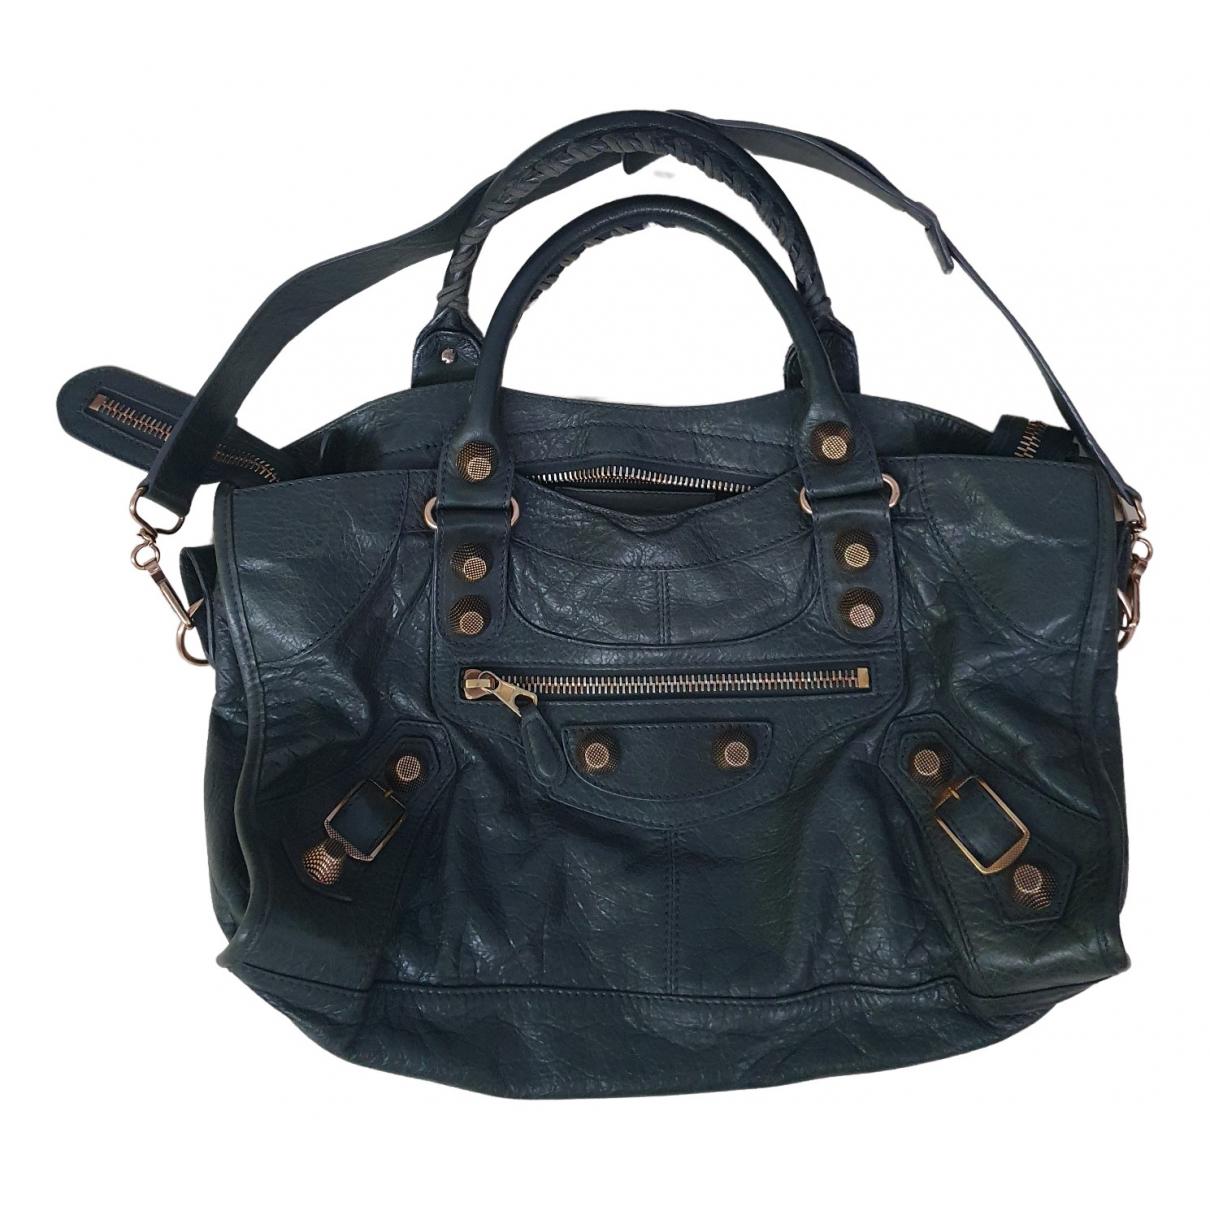 Balenciaga Part Time Anthracite Leather handbag for Women \N